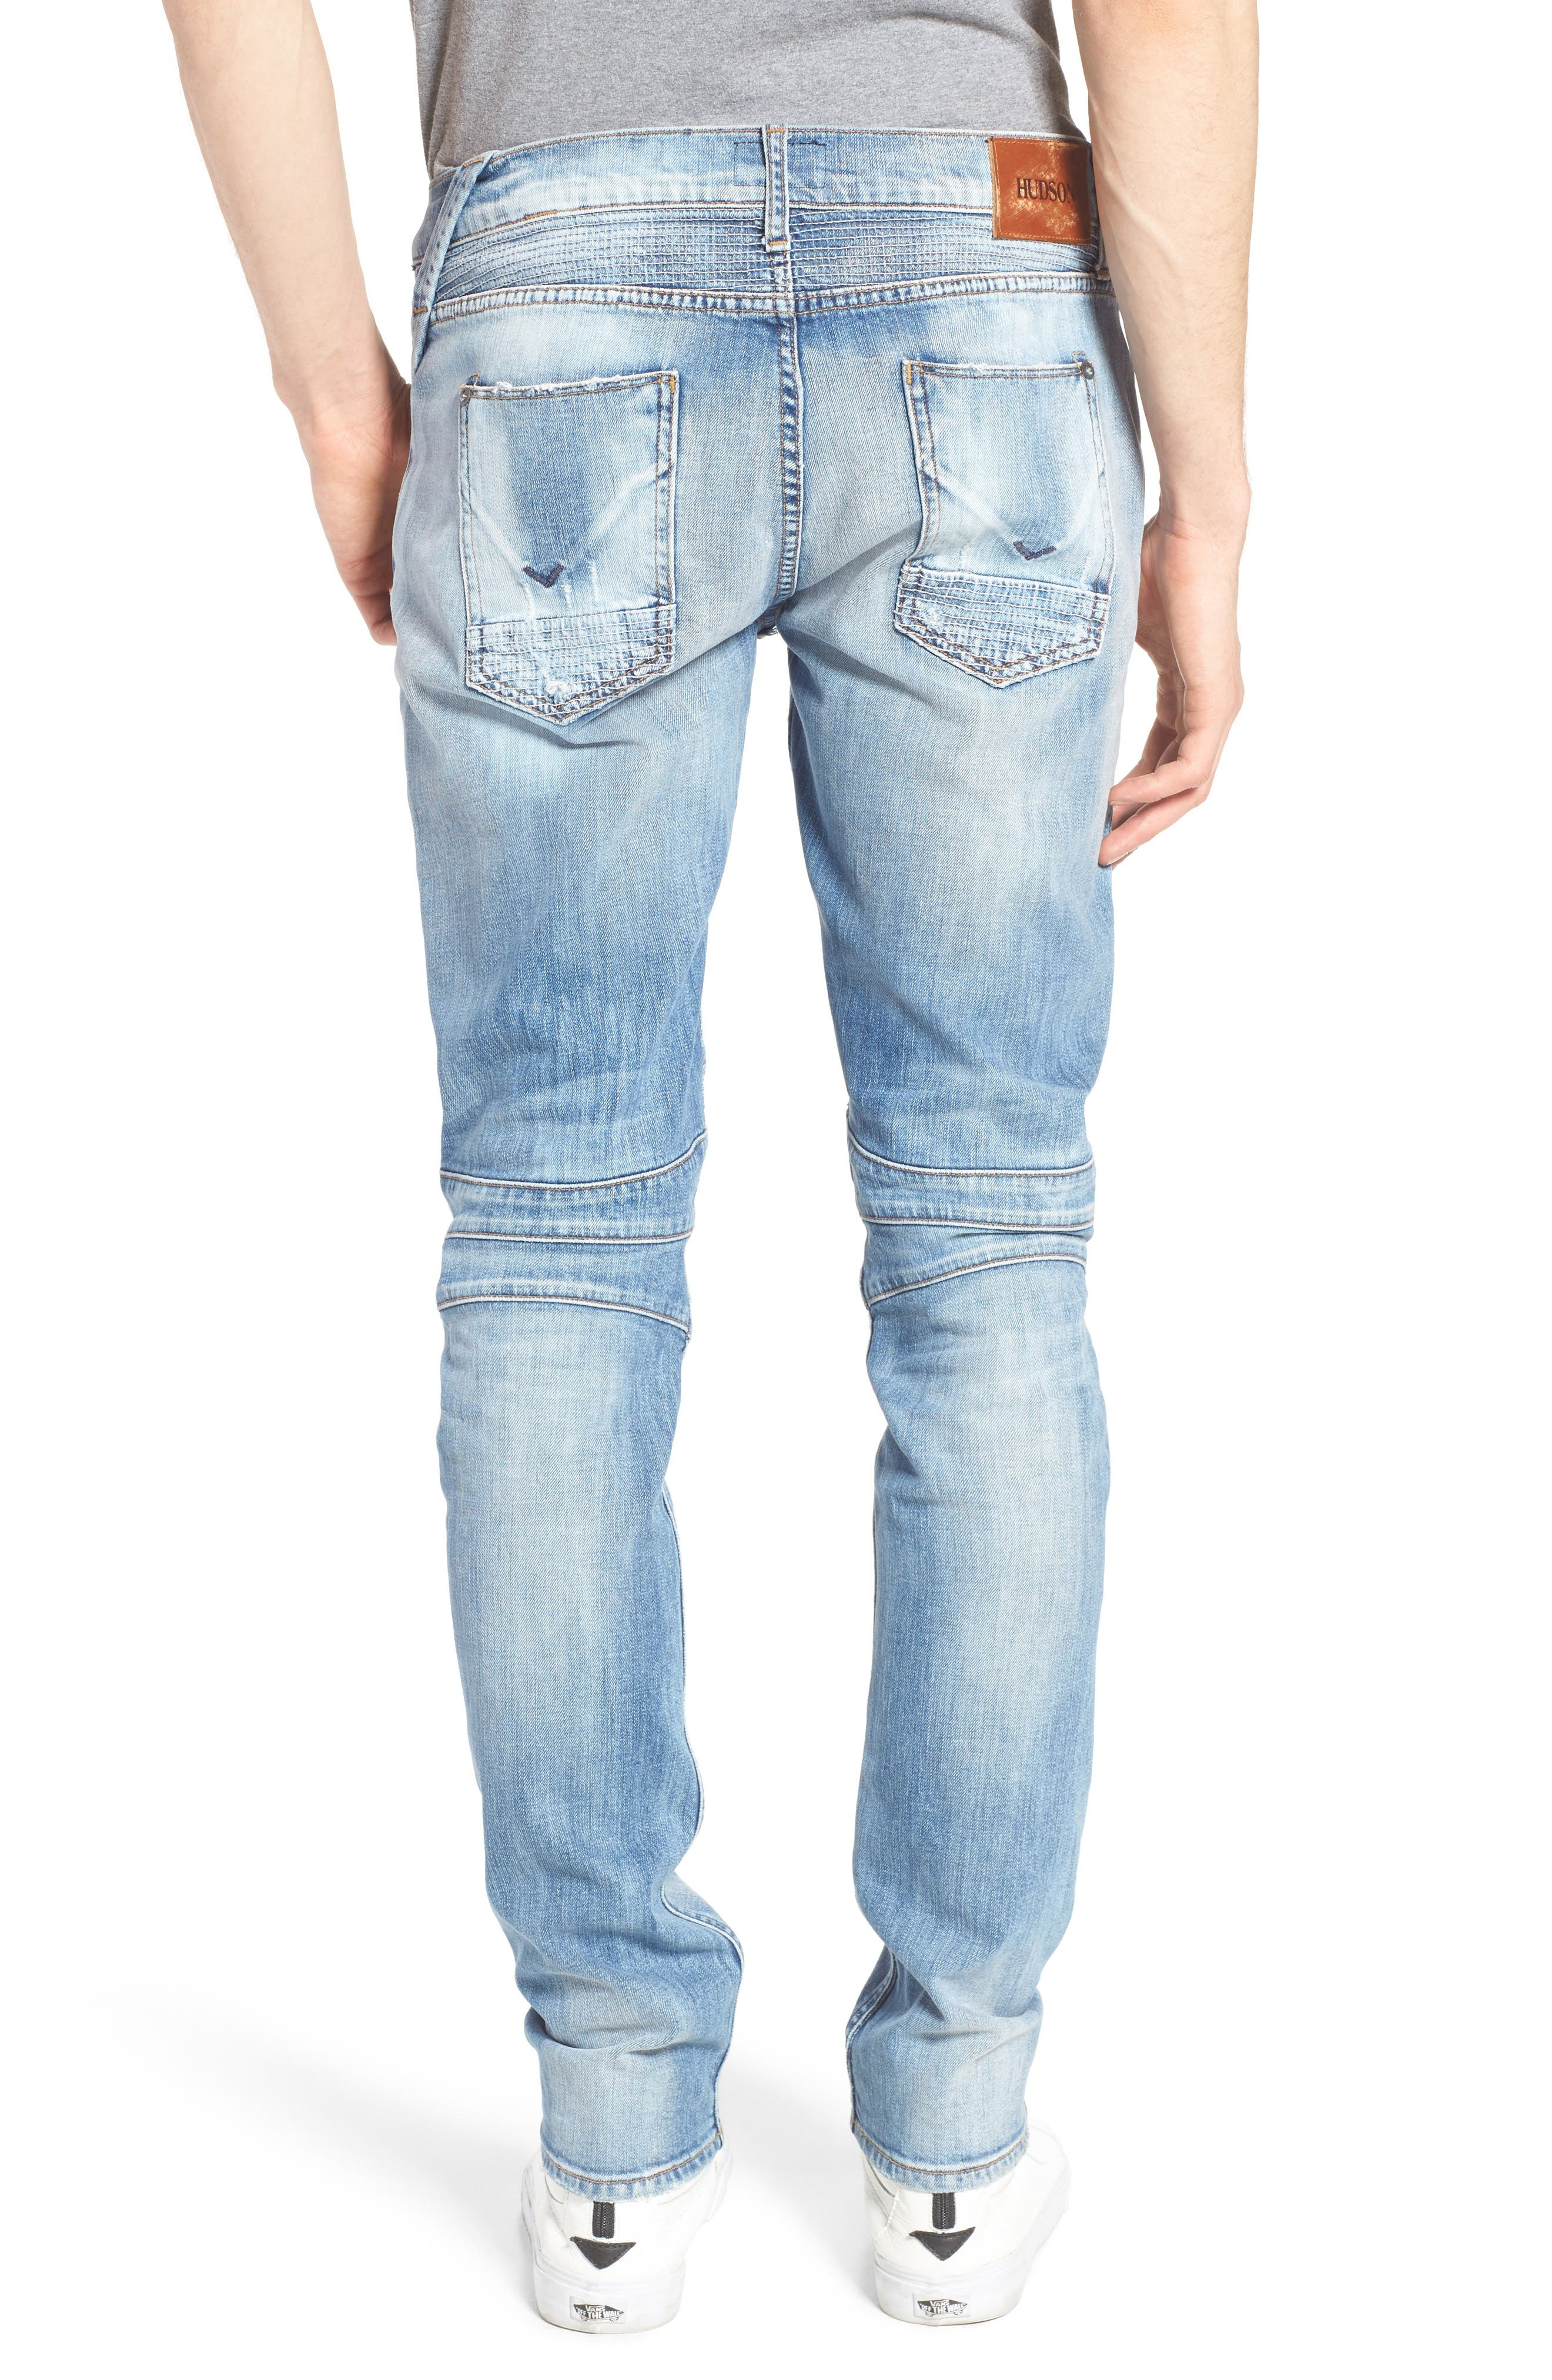 Blinder Skinny Fit Moto Jeans,                             Alternate thumbnail 2, color,                             429